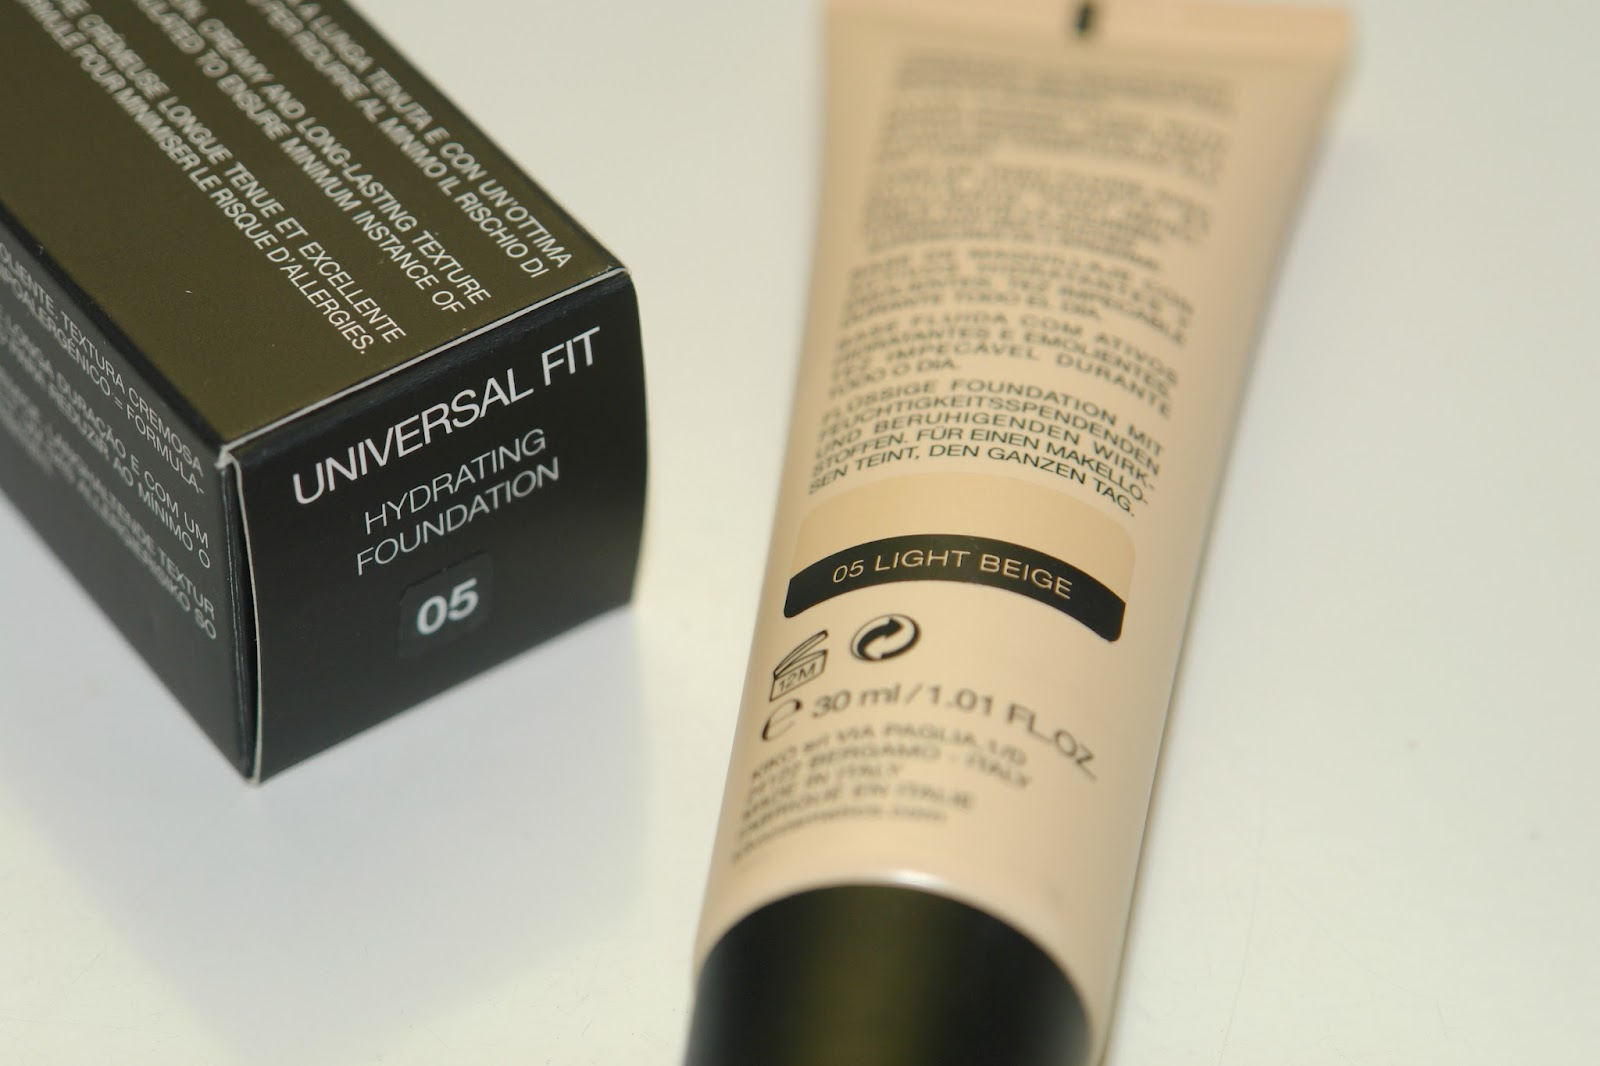 KIKO Universal Fit Hydrating Foundation review, foundation, KIKO, make up, review, beauty blogger